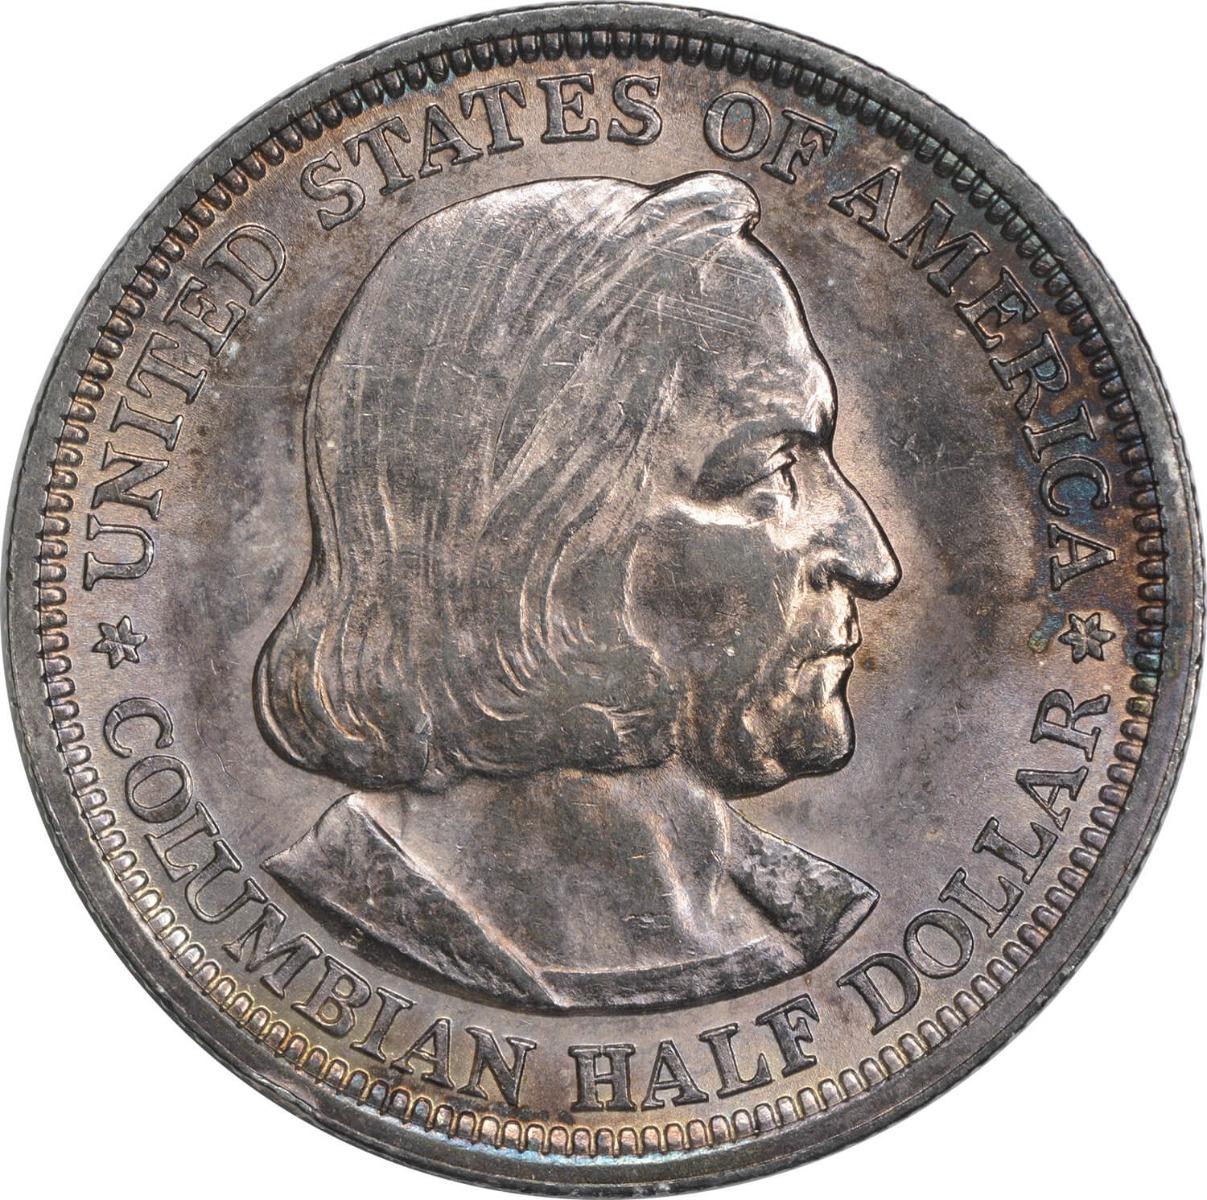 Columbian Commemorative Half Dollar 1893 AU58 Uncertified